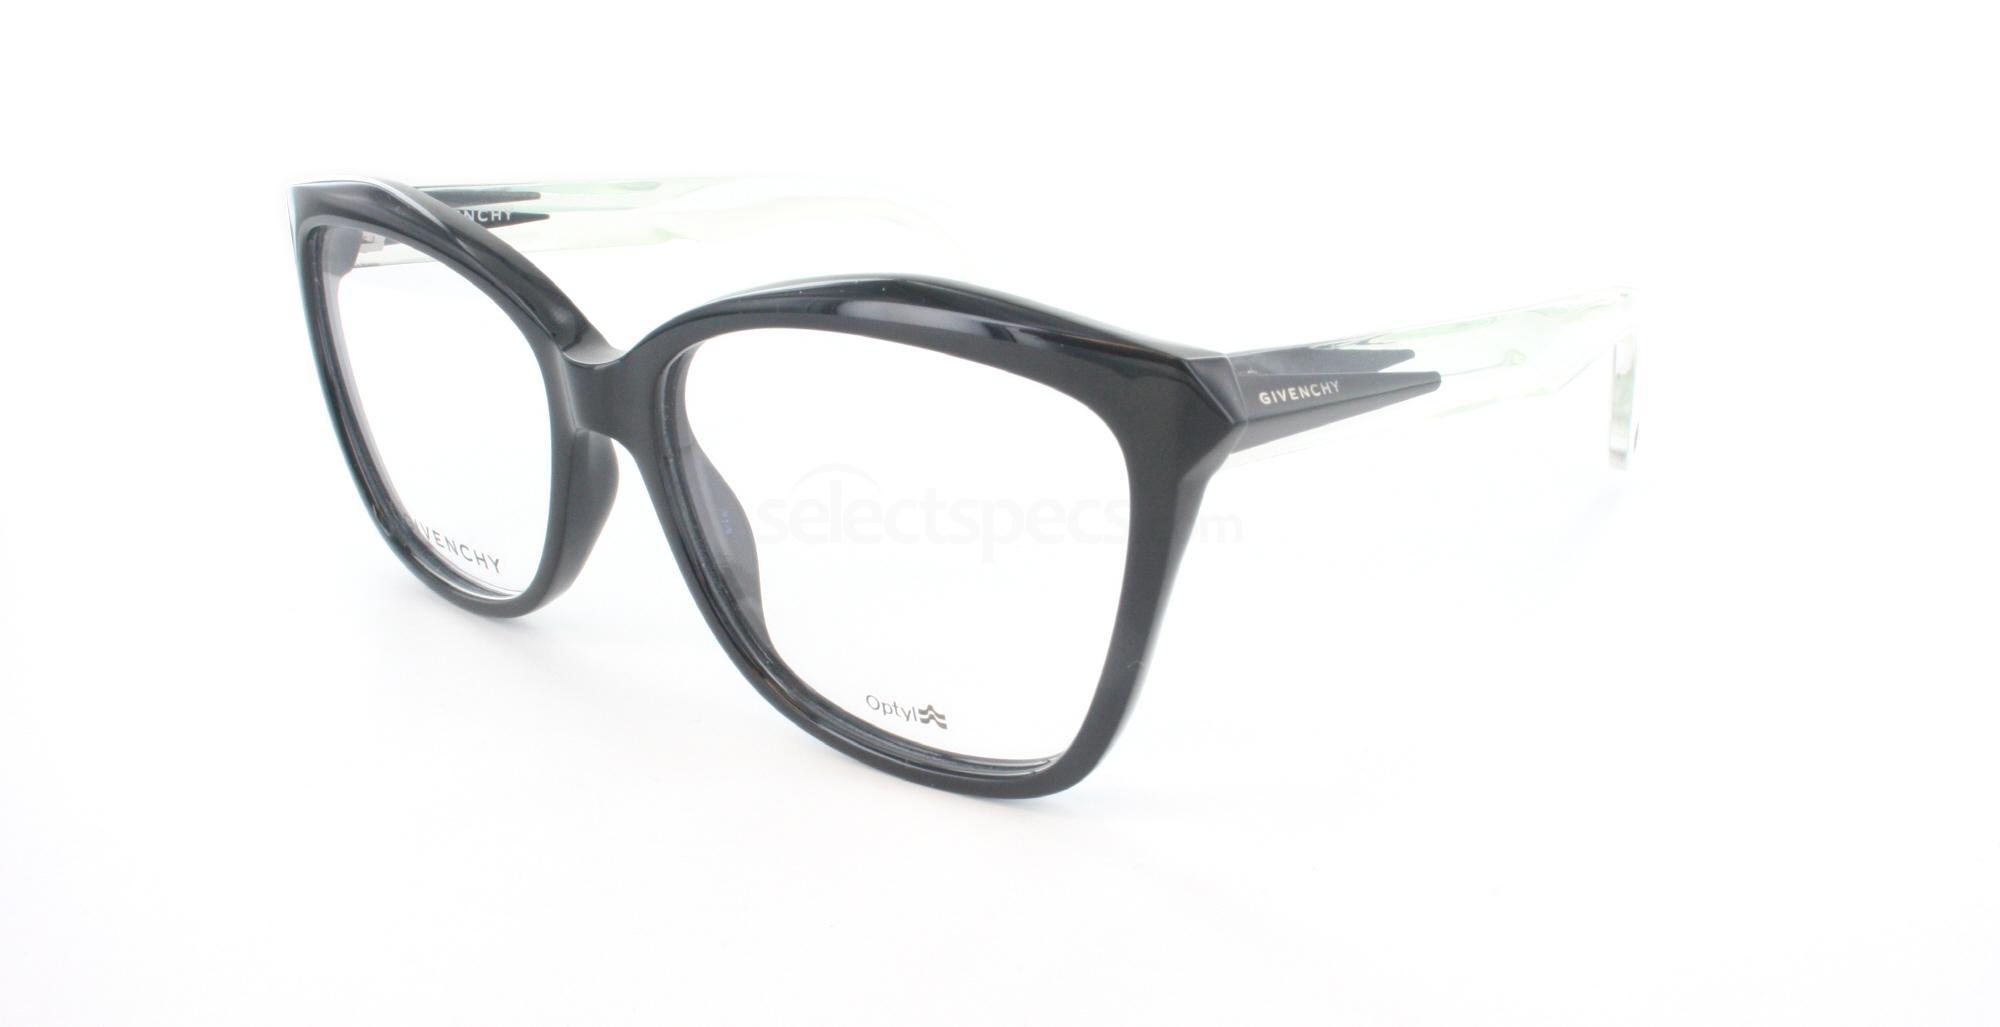 2aa9d0caf4de givenchy gv 0008 glasses free lenses   delivery omnioptics australia.  SELECTSPECS